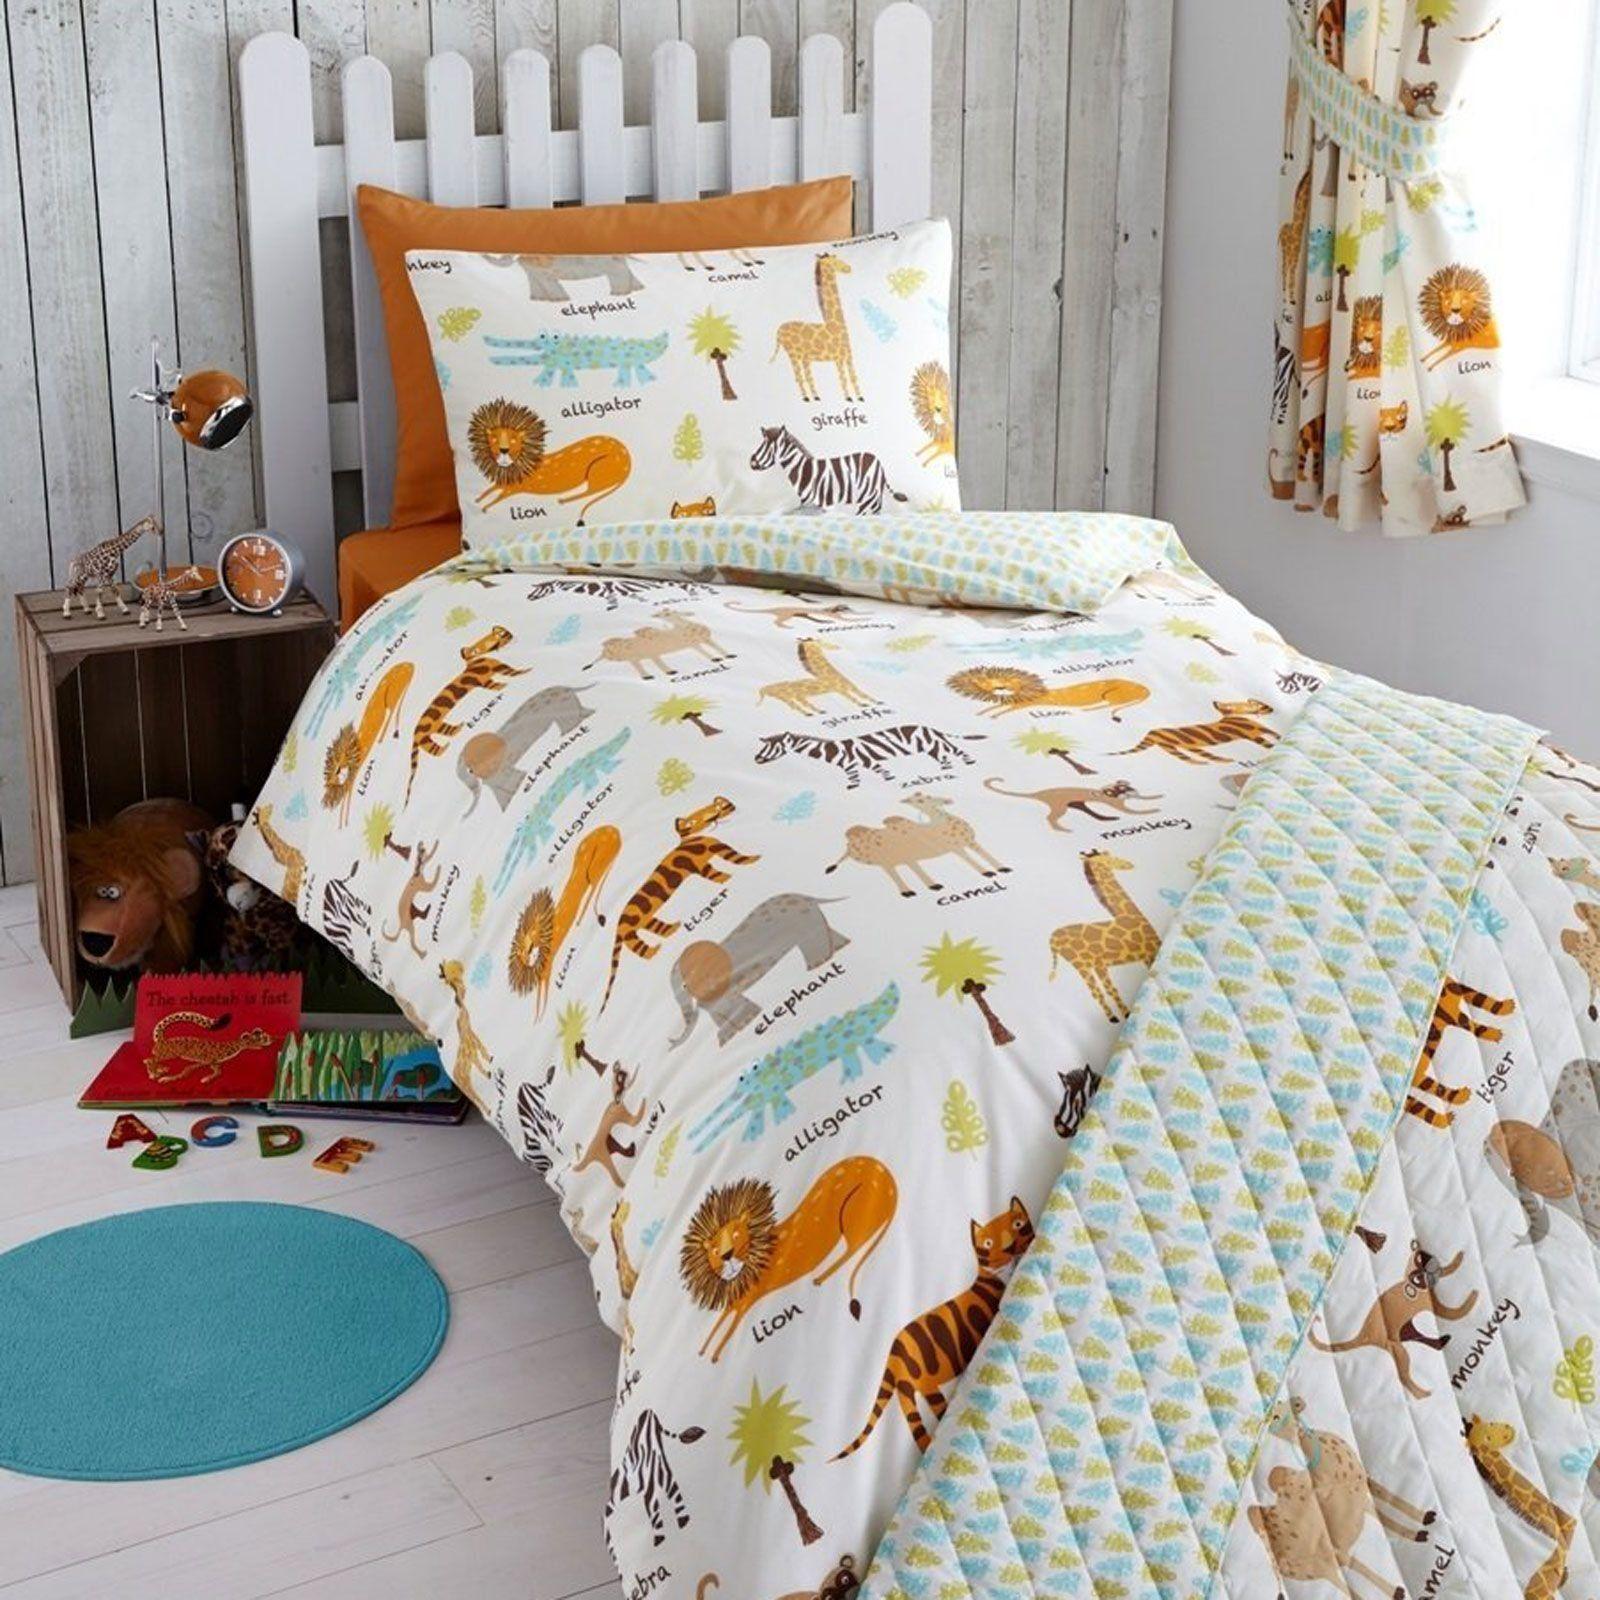 MY SAFARI ZEBRA ELEPHANT MONKEY JUNIOR BABY BOY COT BED DUVET COVER BEDDING SET